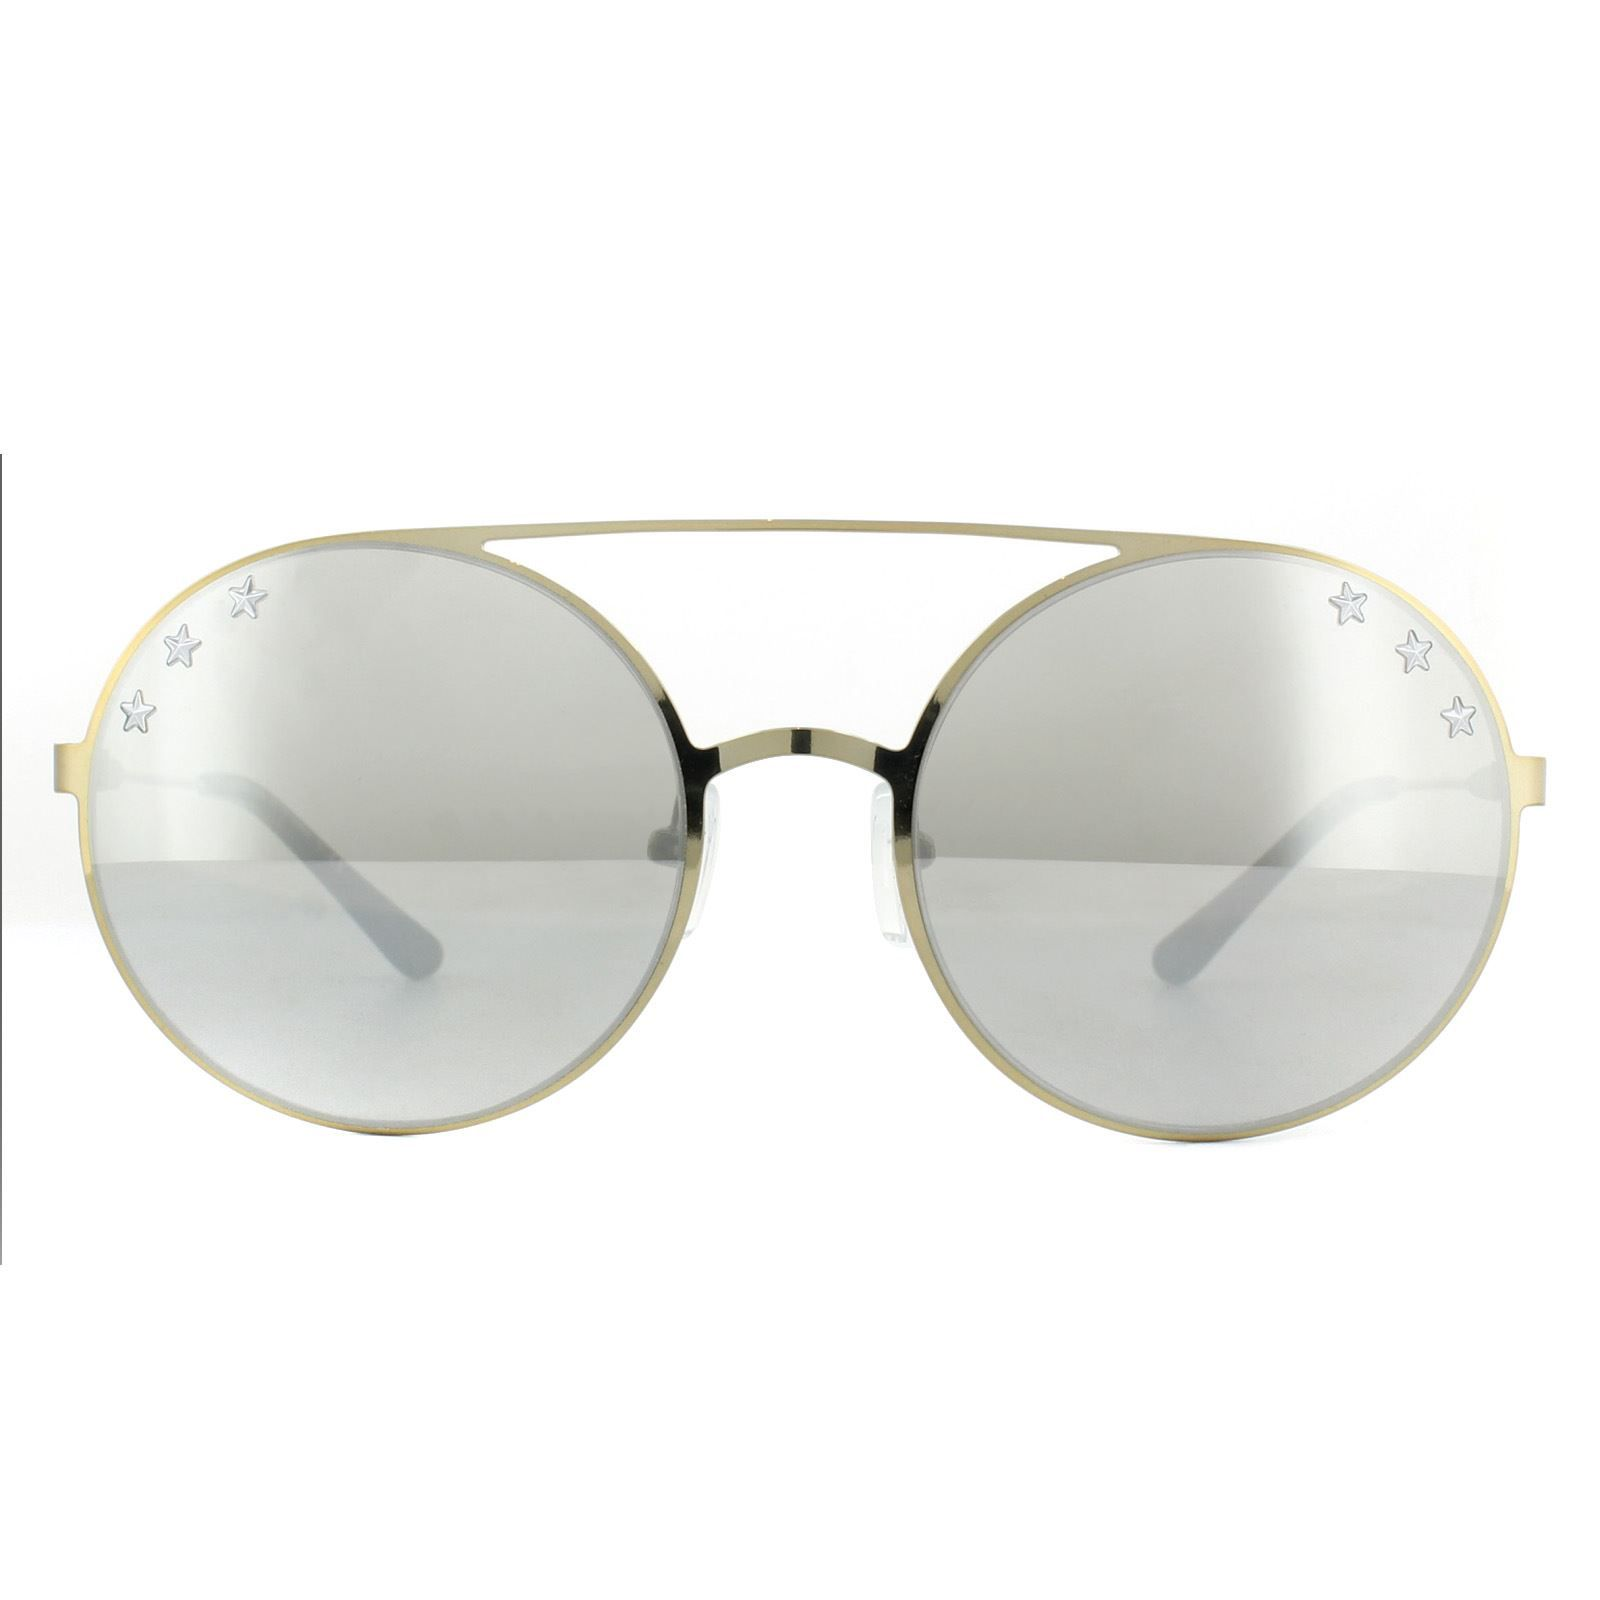 Michael Kors Sunglasses Cabo MK1027 11936G Pale Gold Tone Silver Mirror